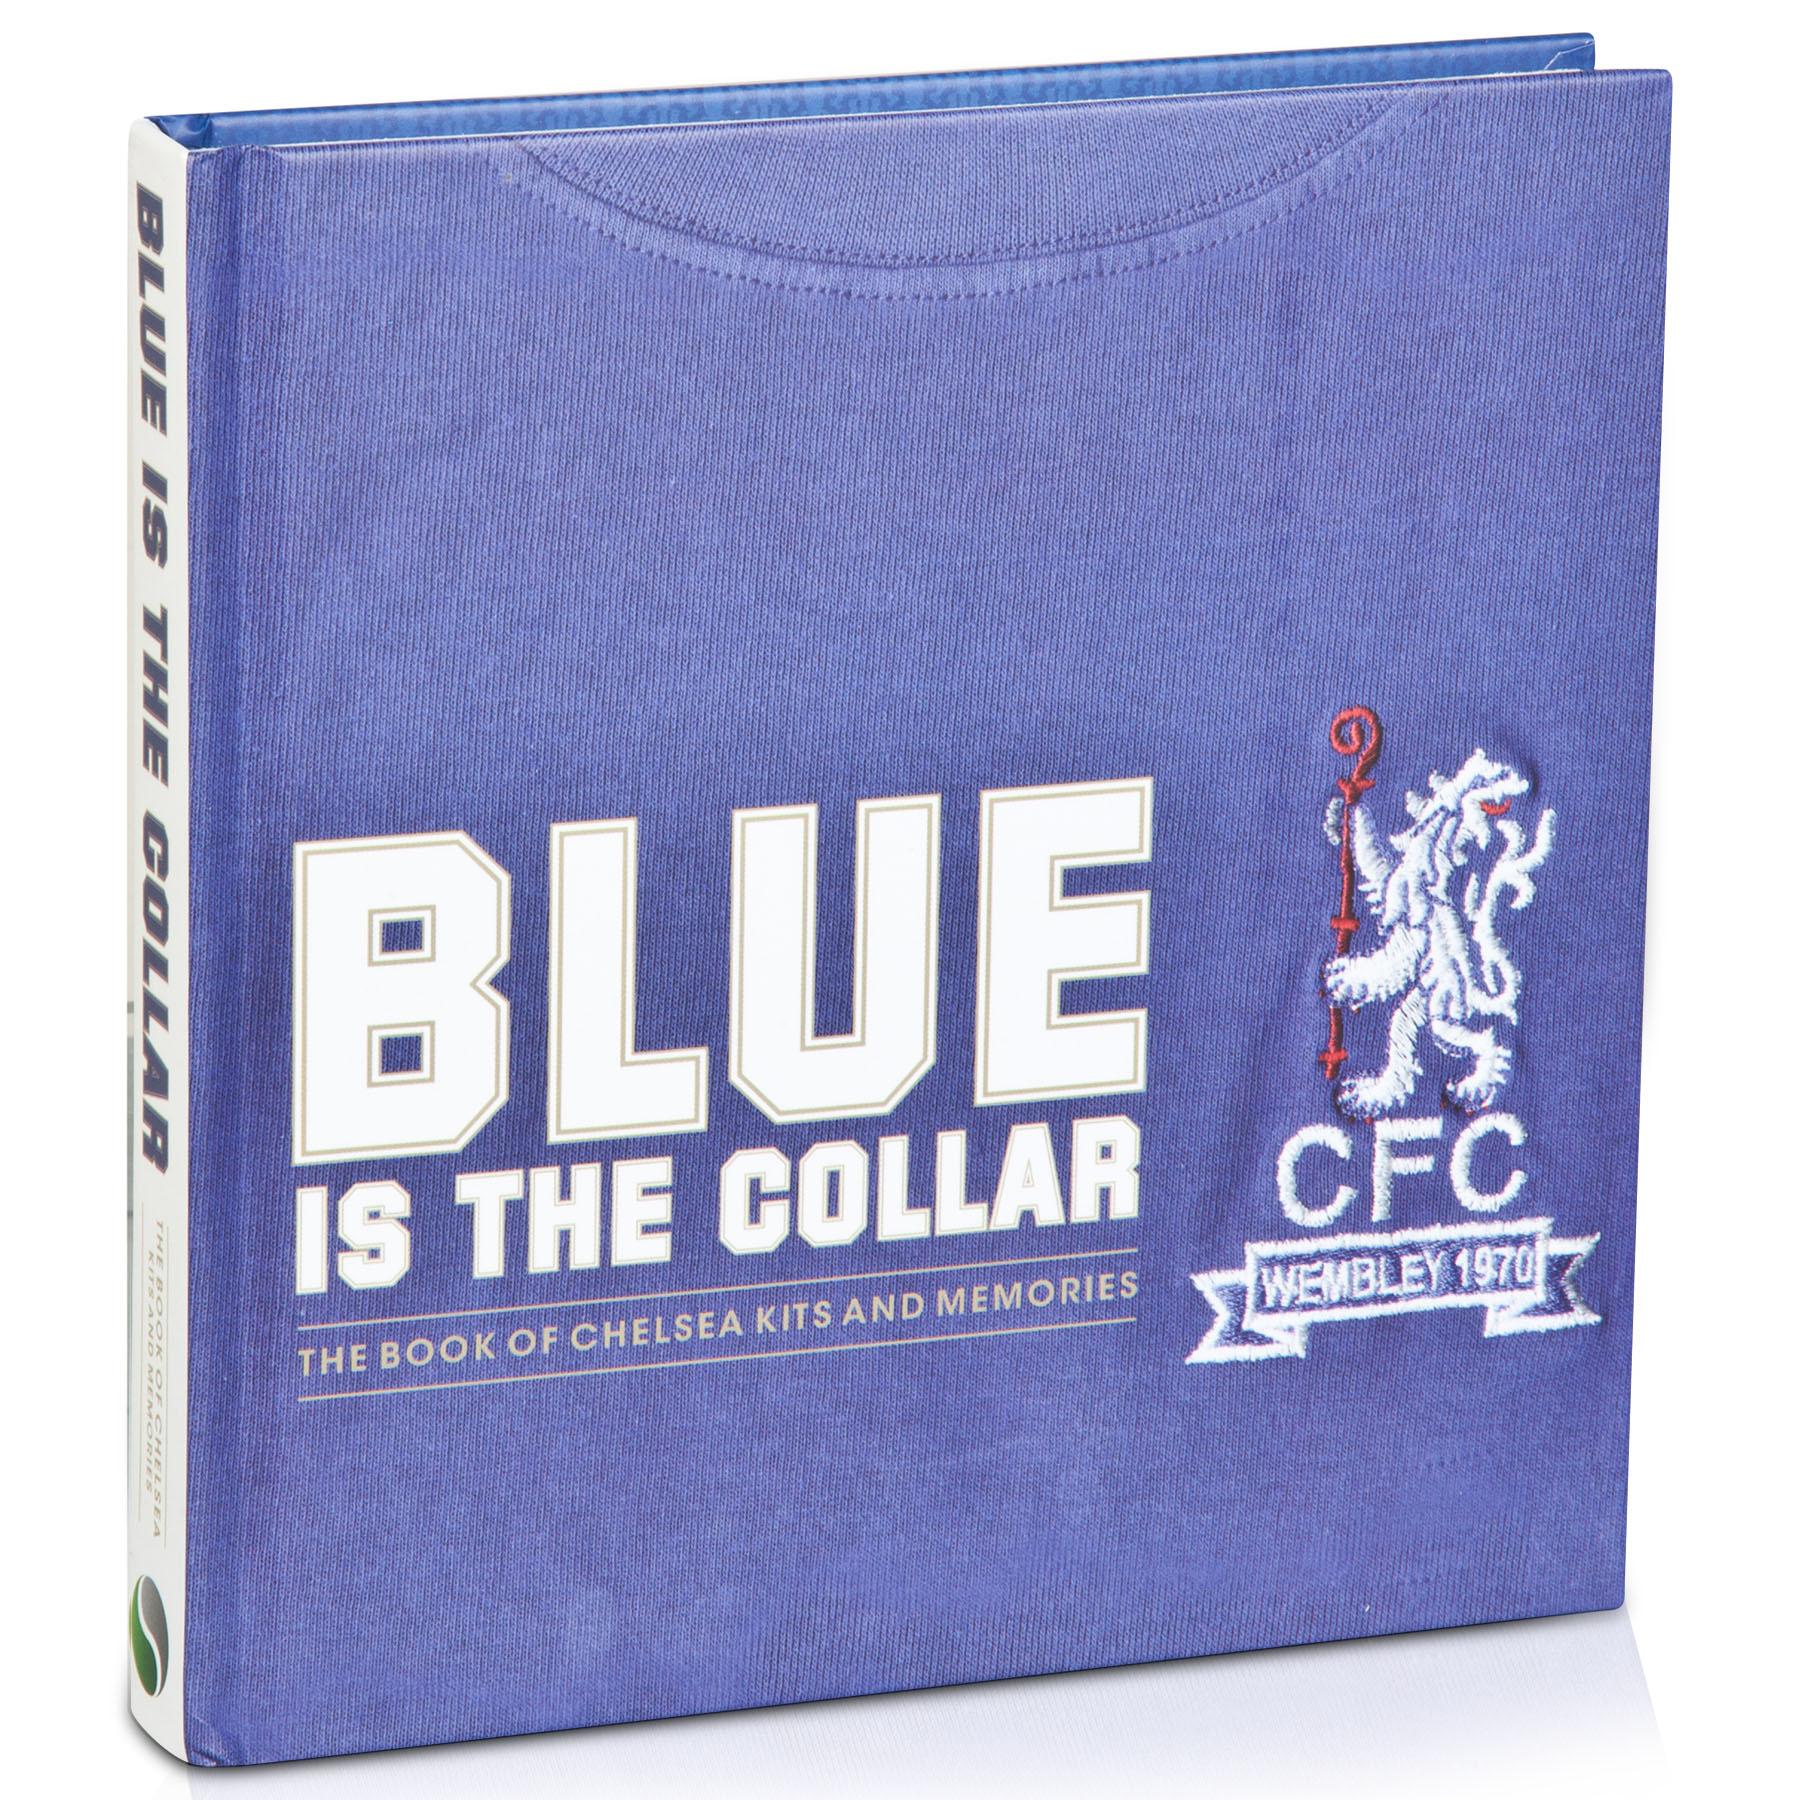 Chelsea Blue Is The Collar - Hardback Book